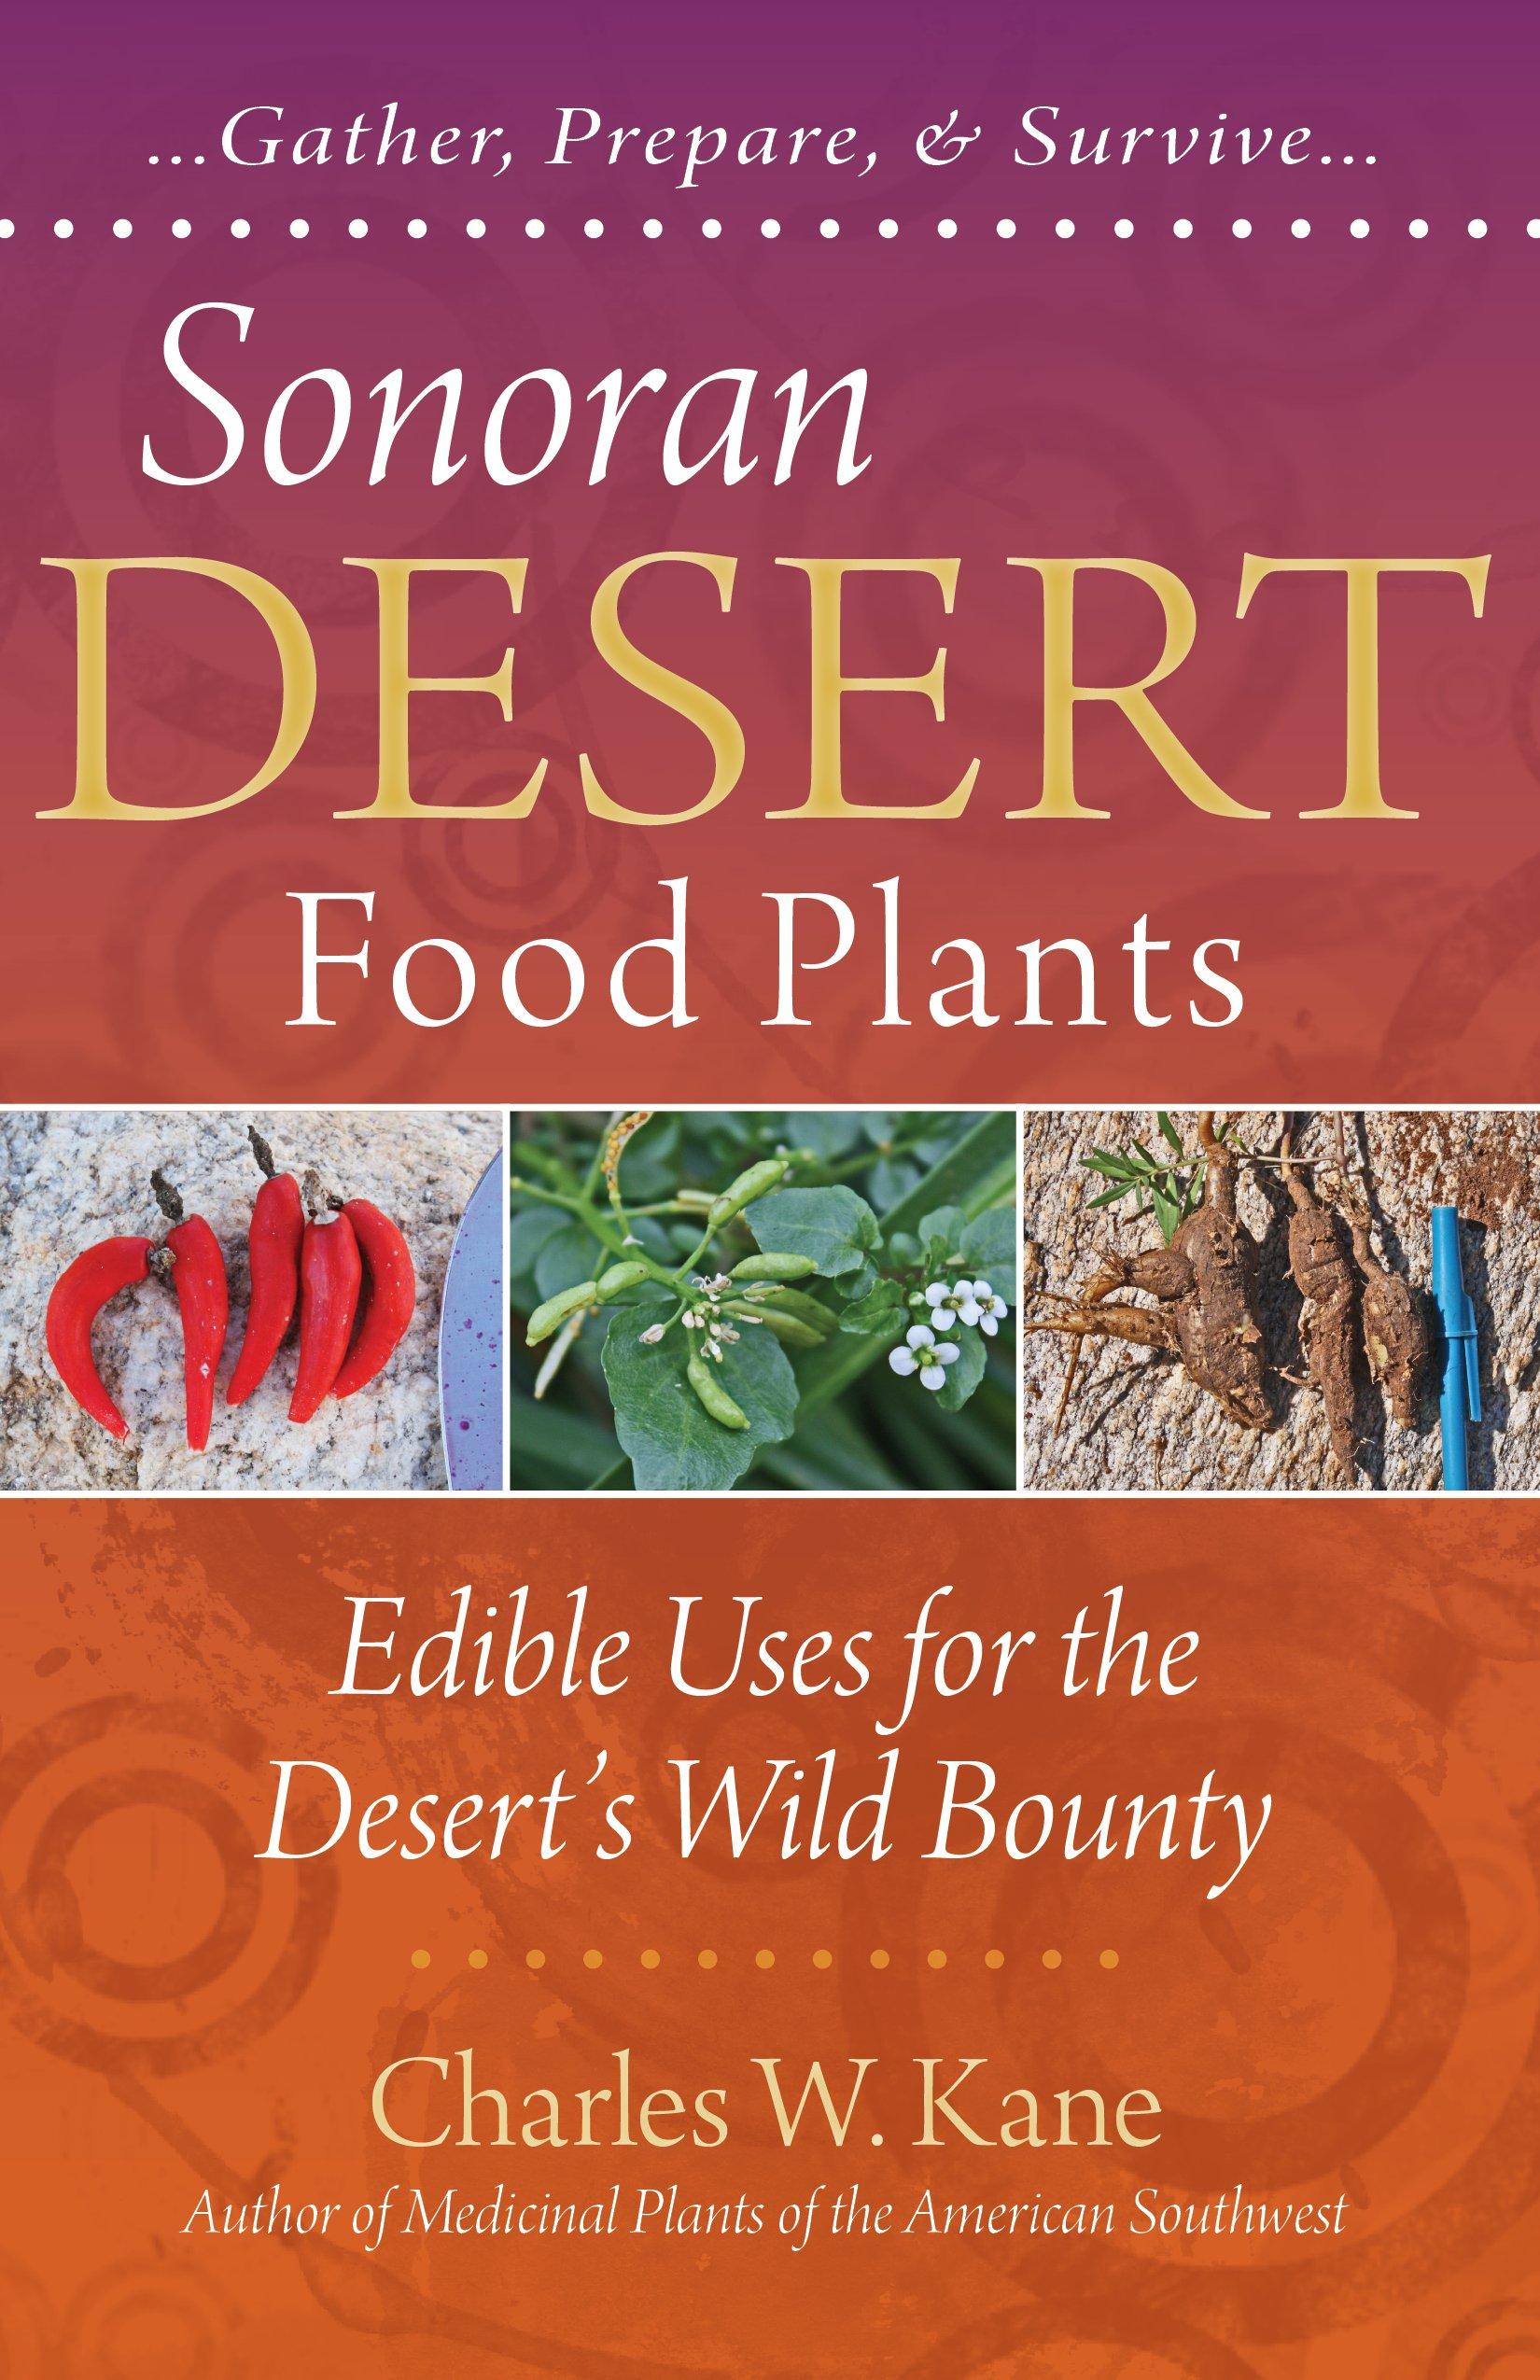 Sonoran Desert Food Plants Deserts product image